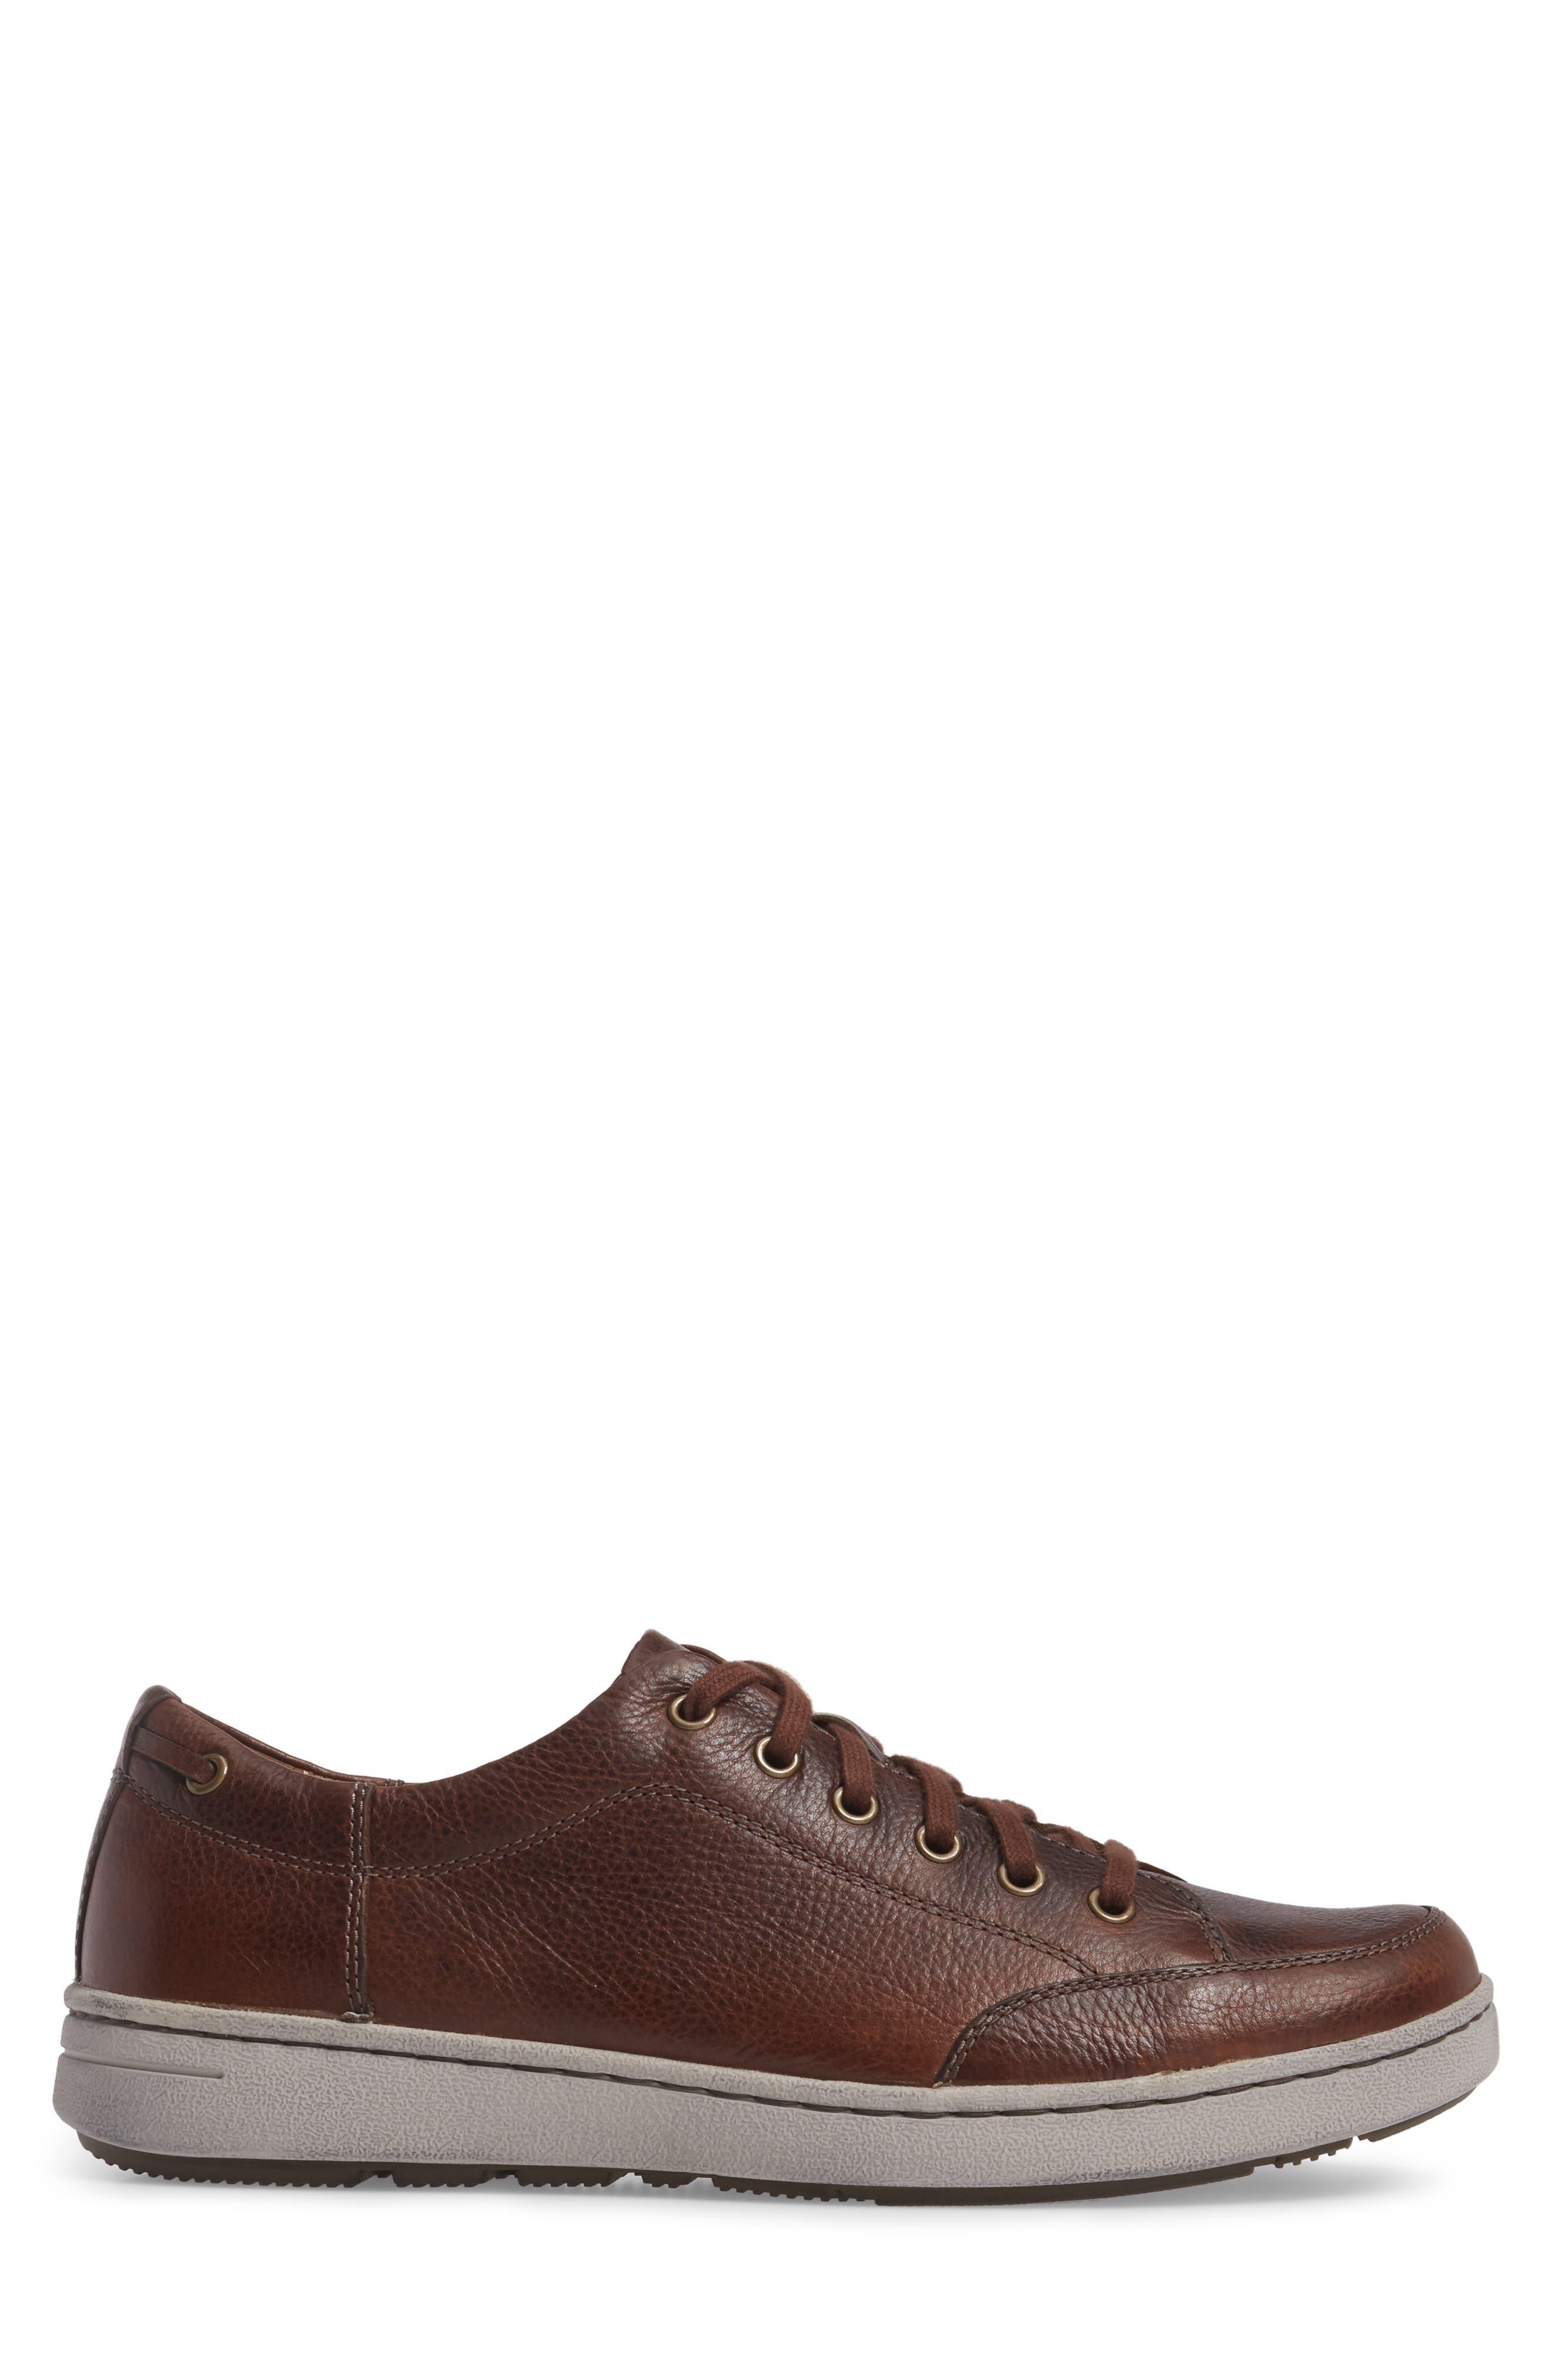 Alternate Image 3  - Dansko 'Vaughn' Water-Resistant Sneaker (Men)